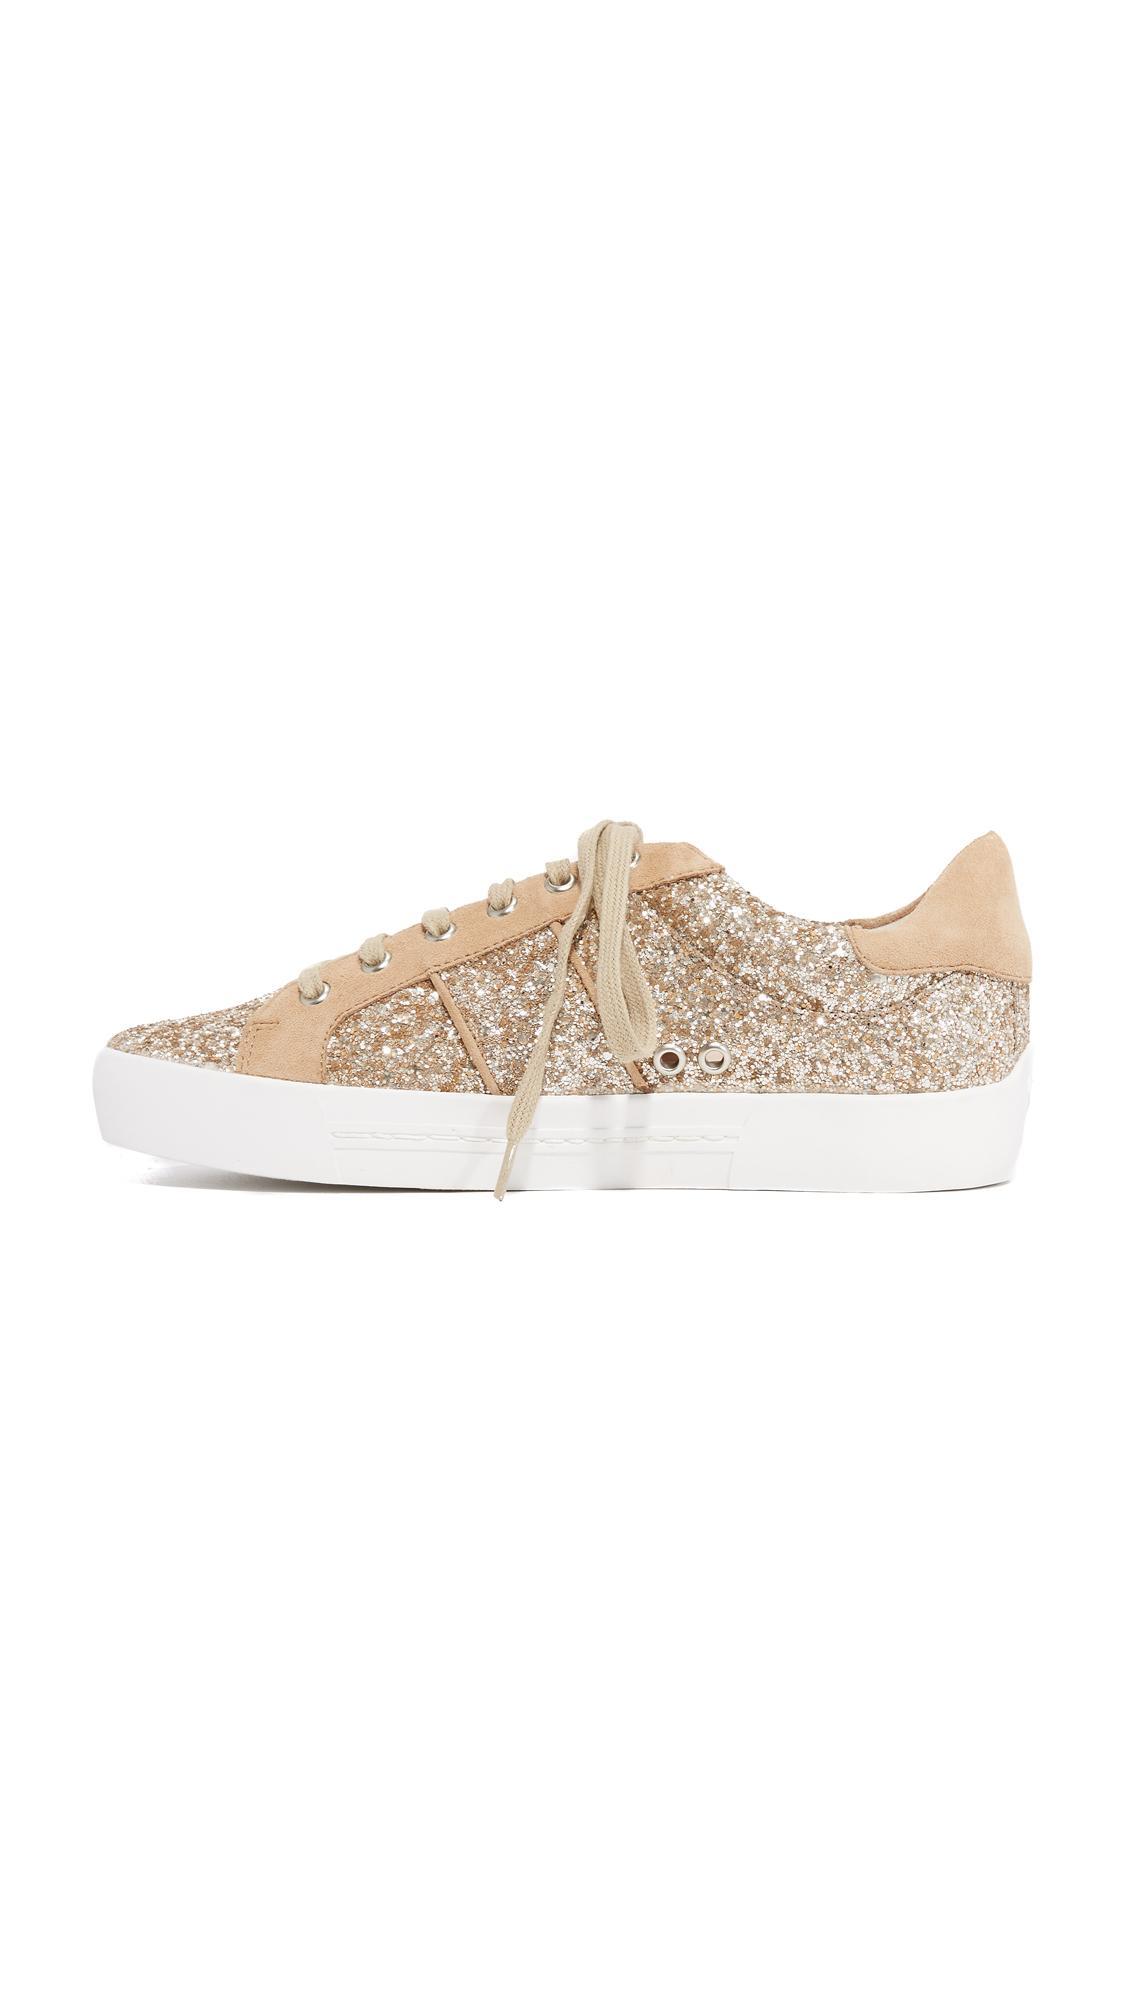 Joie Suede Dakota Sneakers